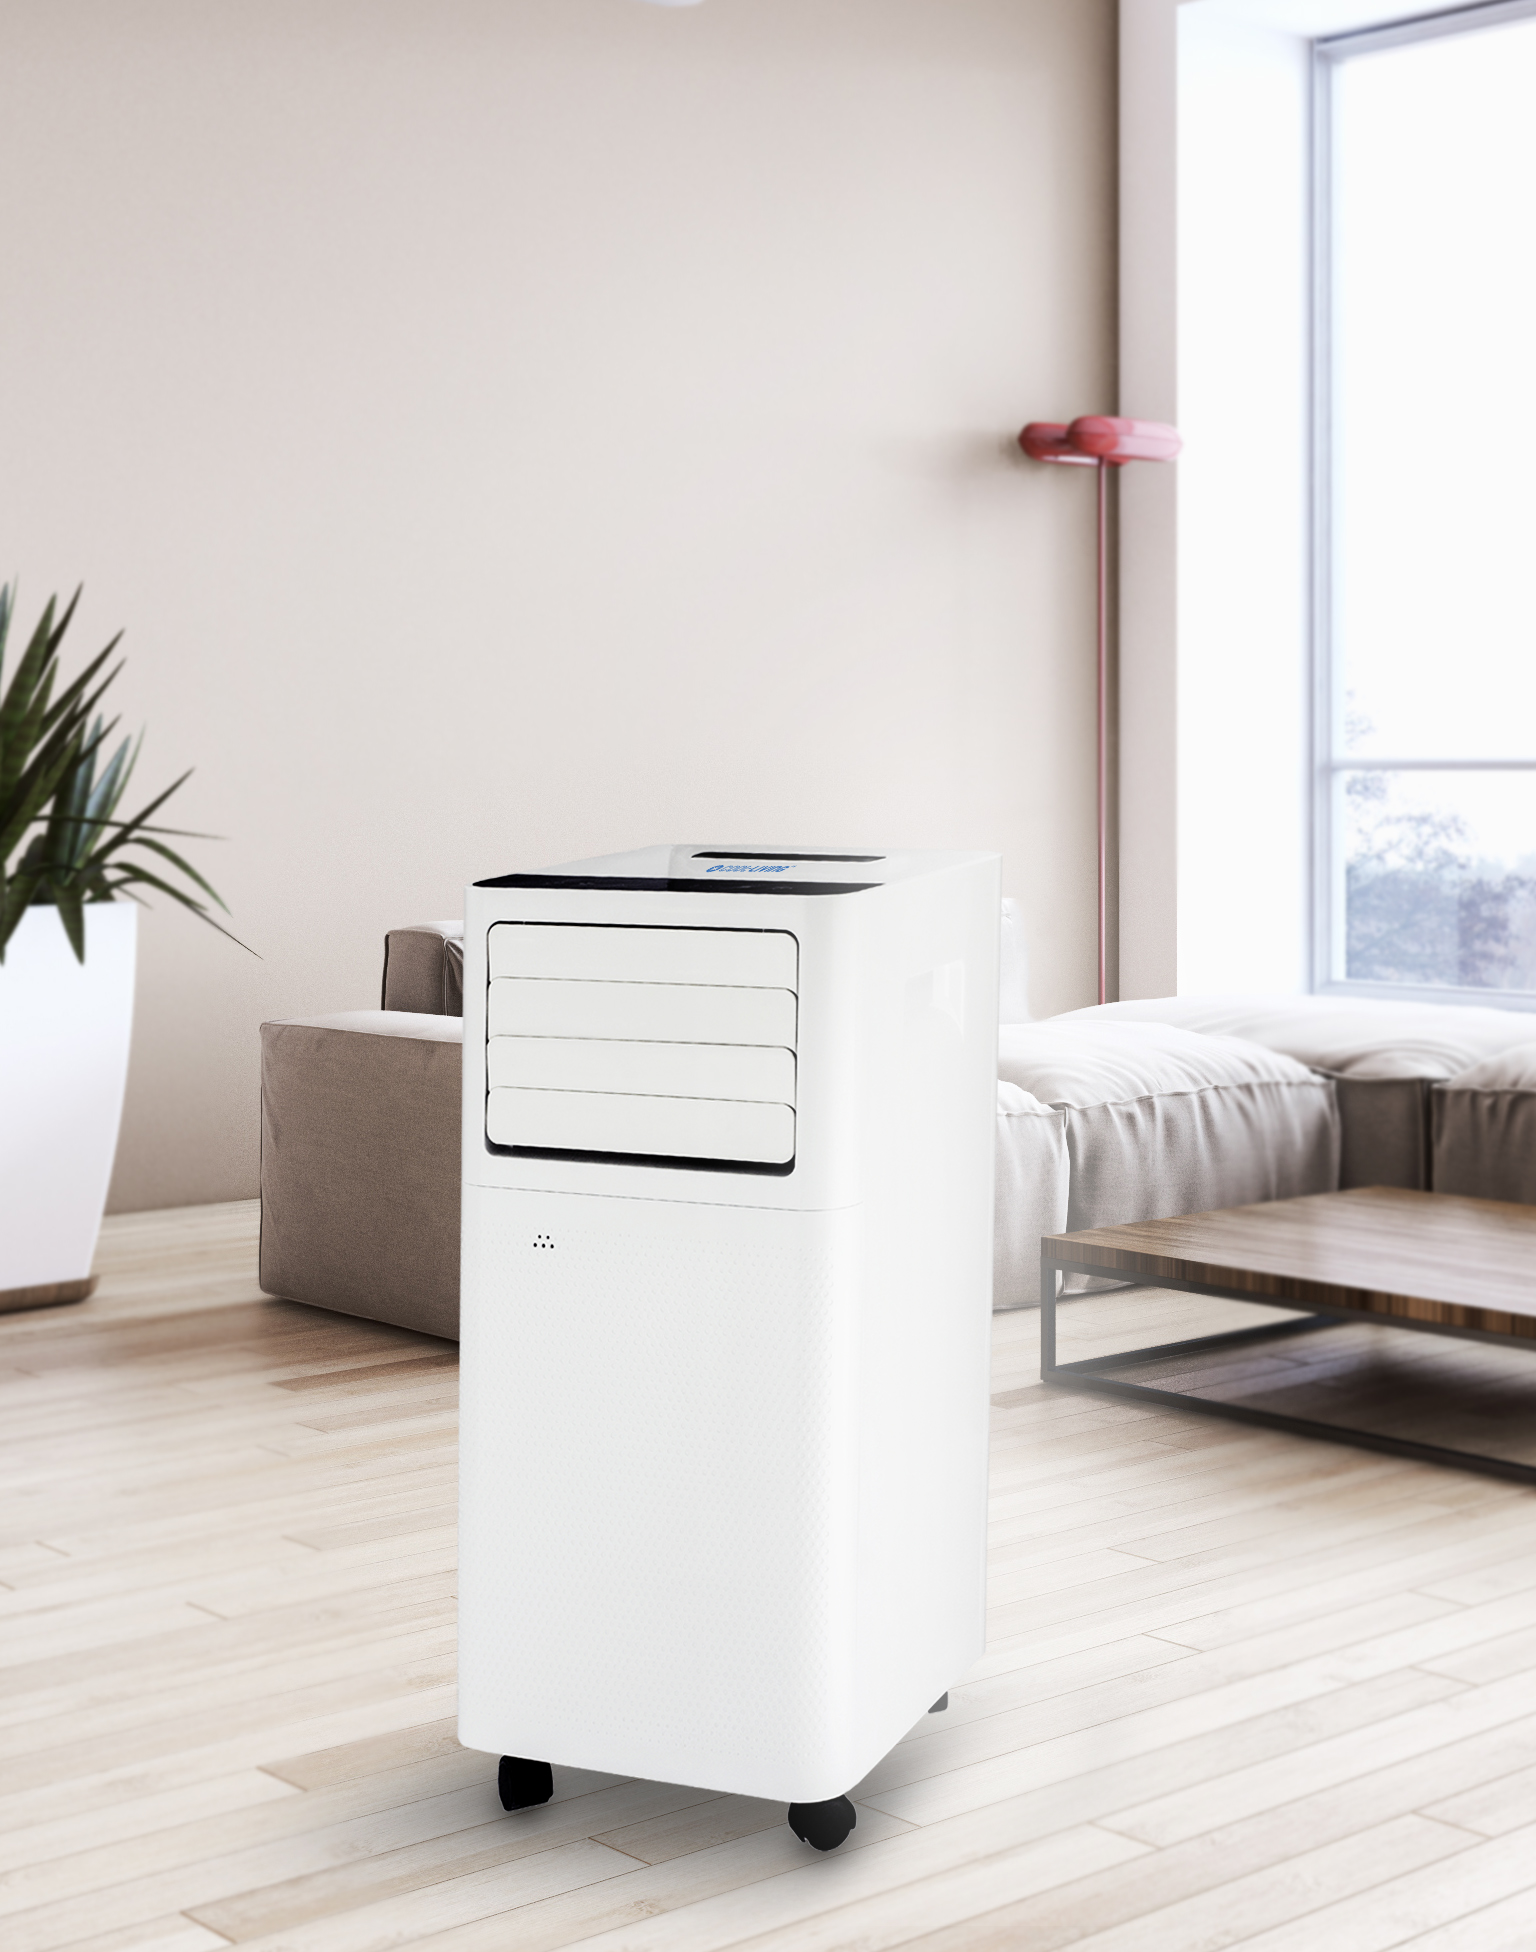 10 000 Btu Ashrae 115 Volt Portable, Living Room Air Conditioner